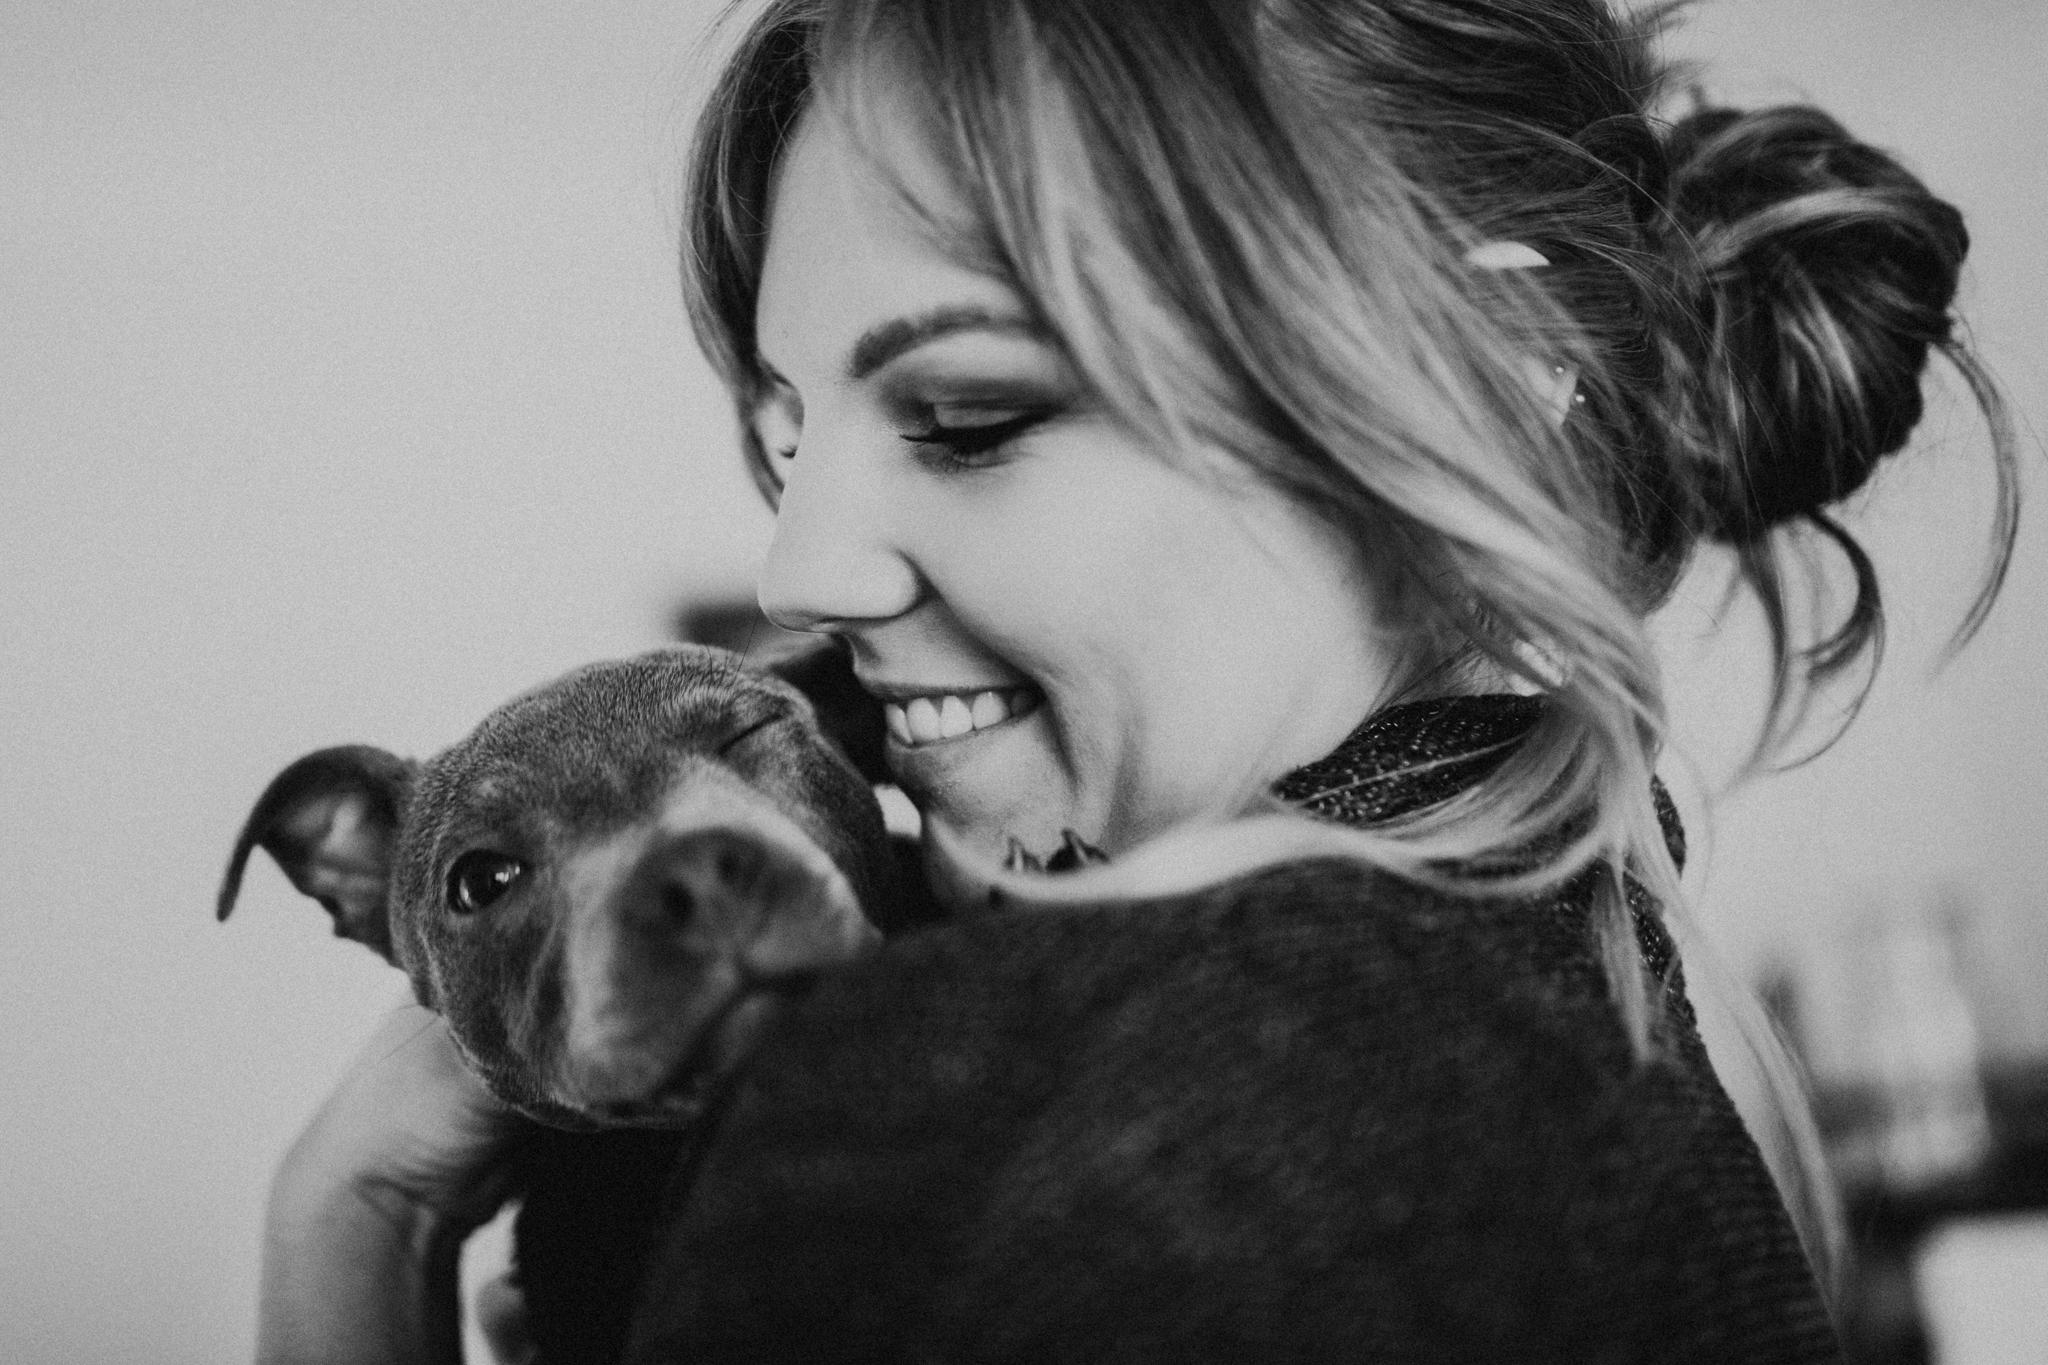 Dog-Human-Session-Photography-Darina-Stoda-Animal-Indigo-15.jpg